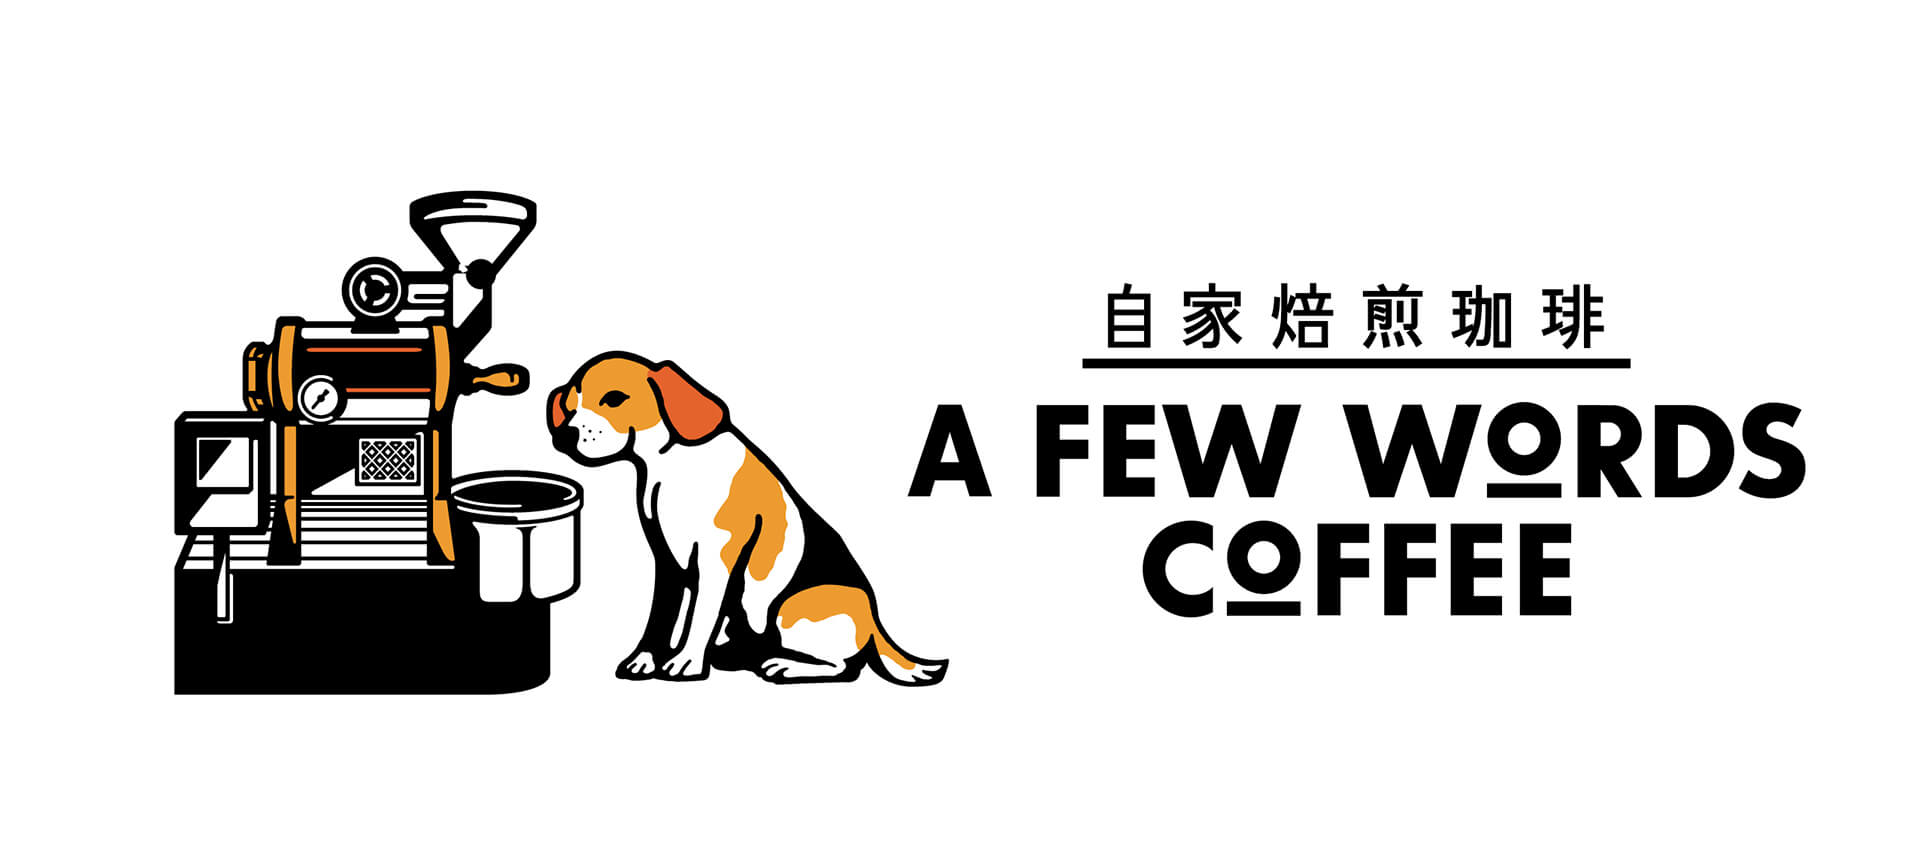 A FEW WORDS COFFEE「高級コーヒー試飲会」